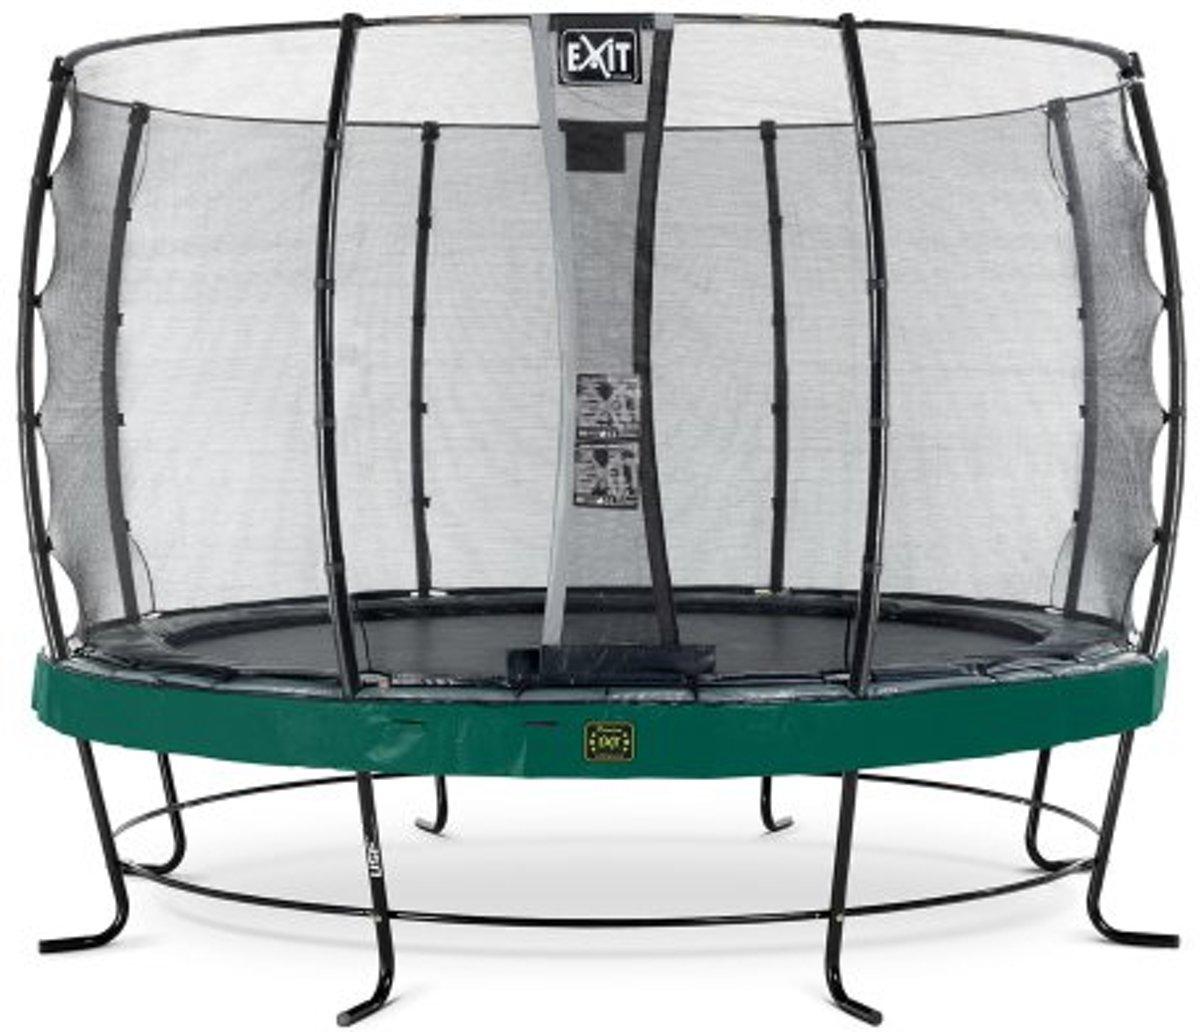 EXIT Elegant Premium trampoline ø366cm met veiligheidsnet Economy - groen